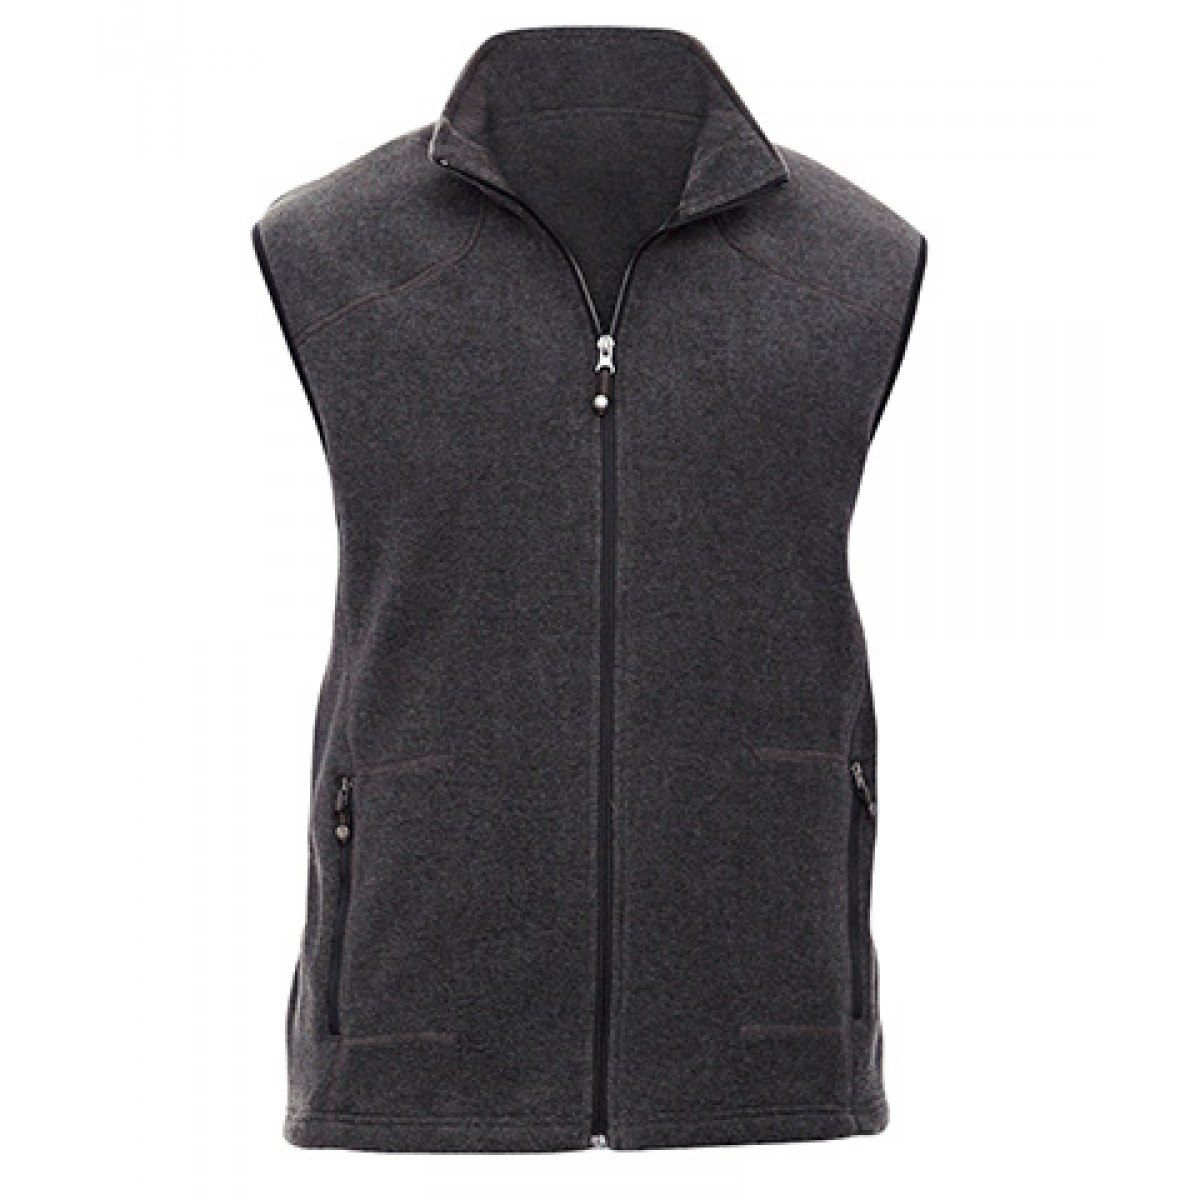 Men's Voyage Fleece Vest-Gray -4XL